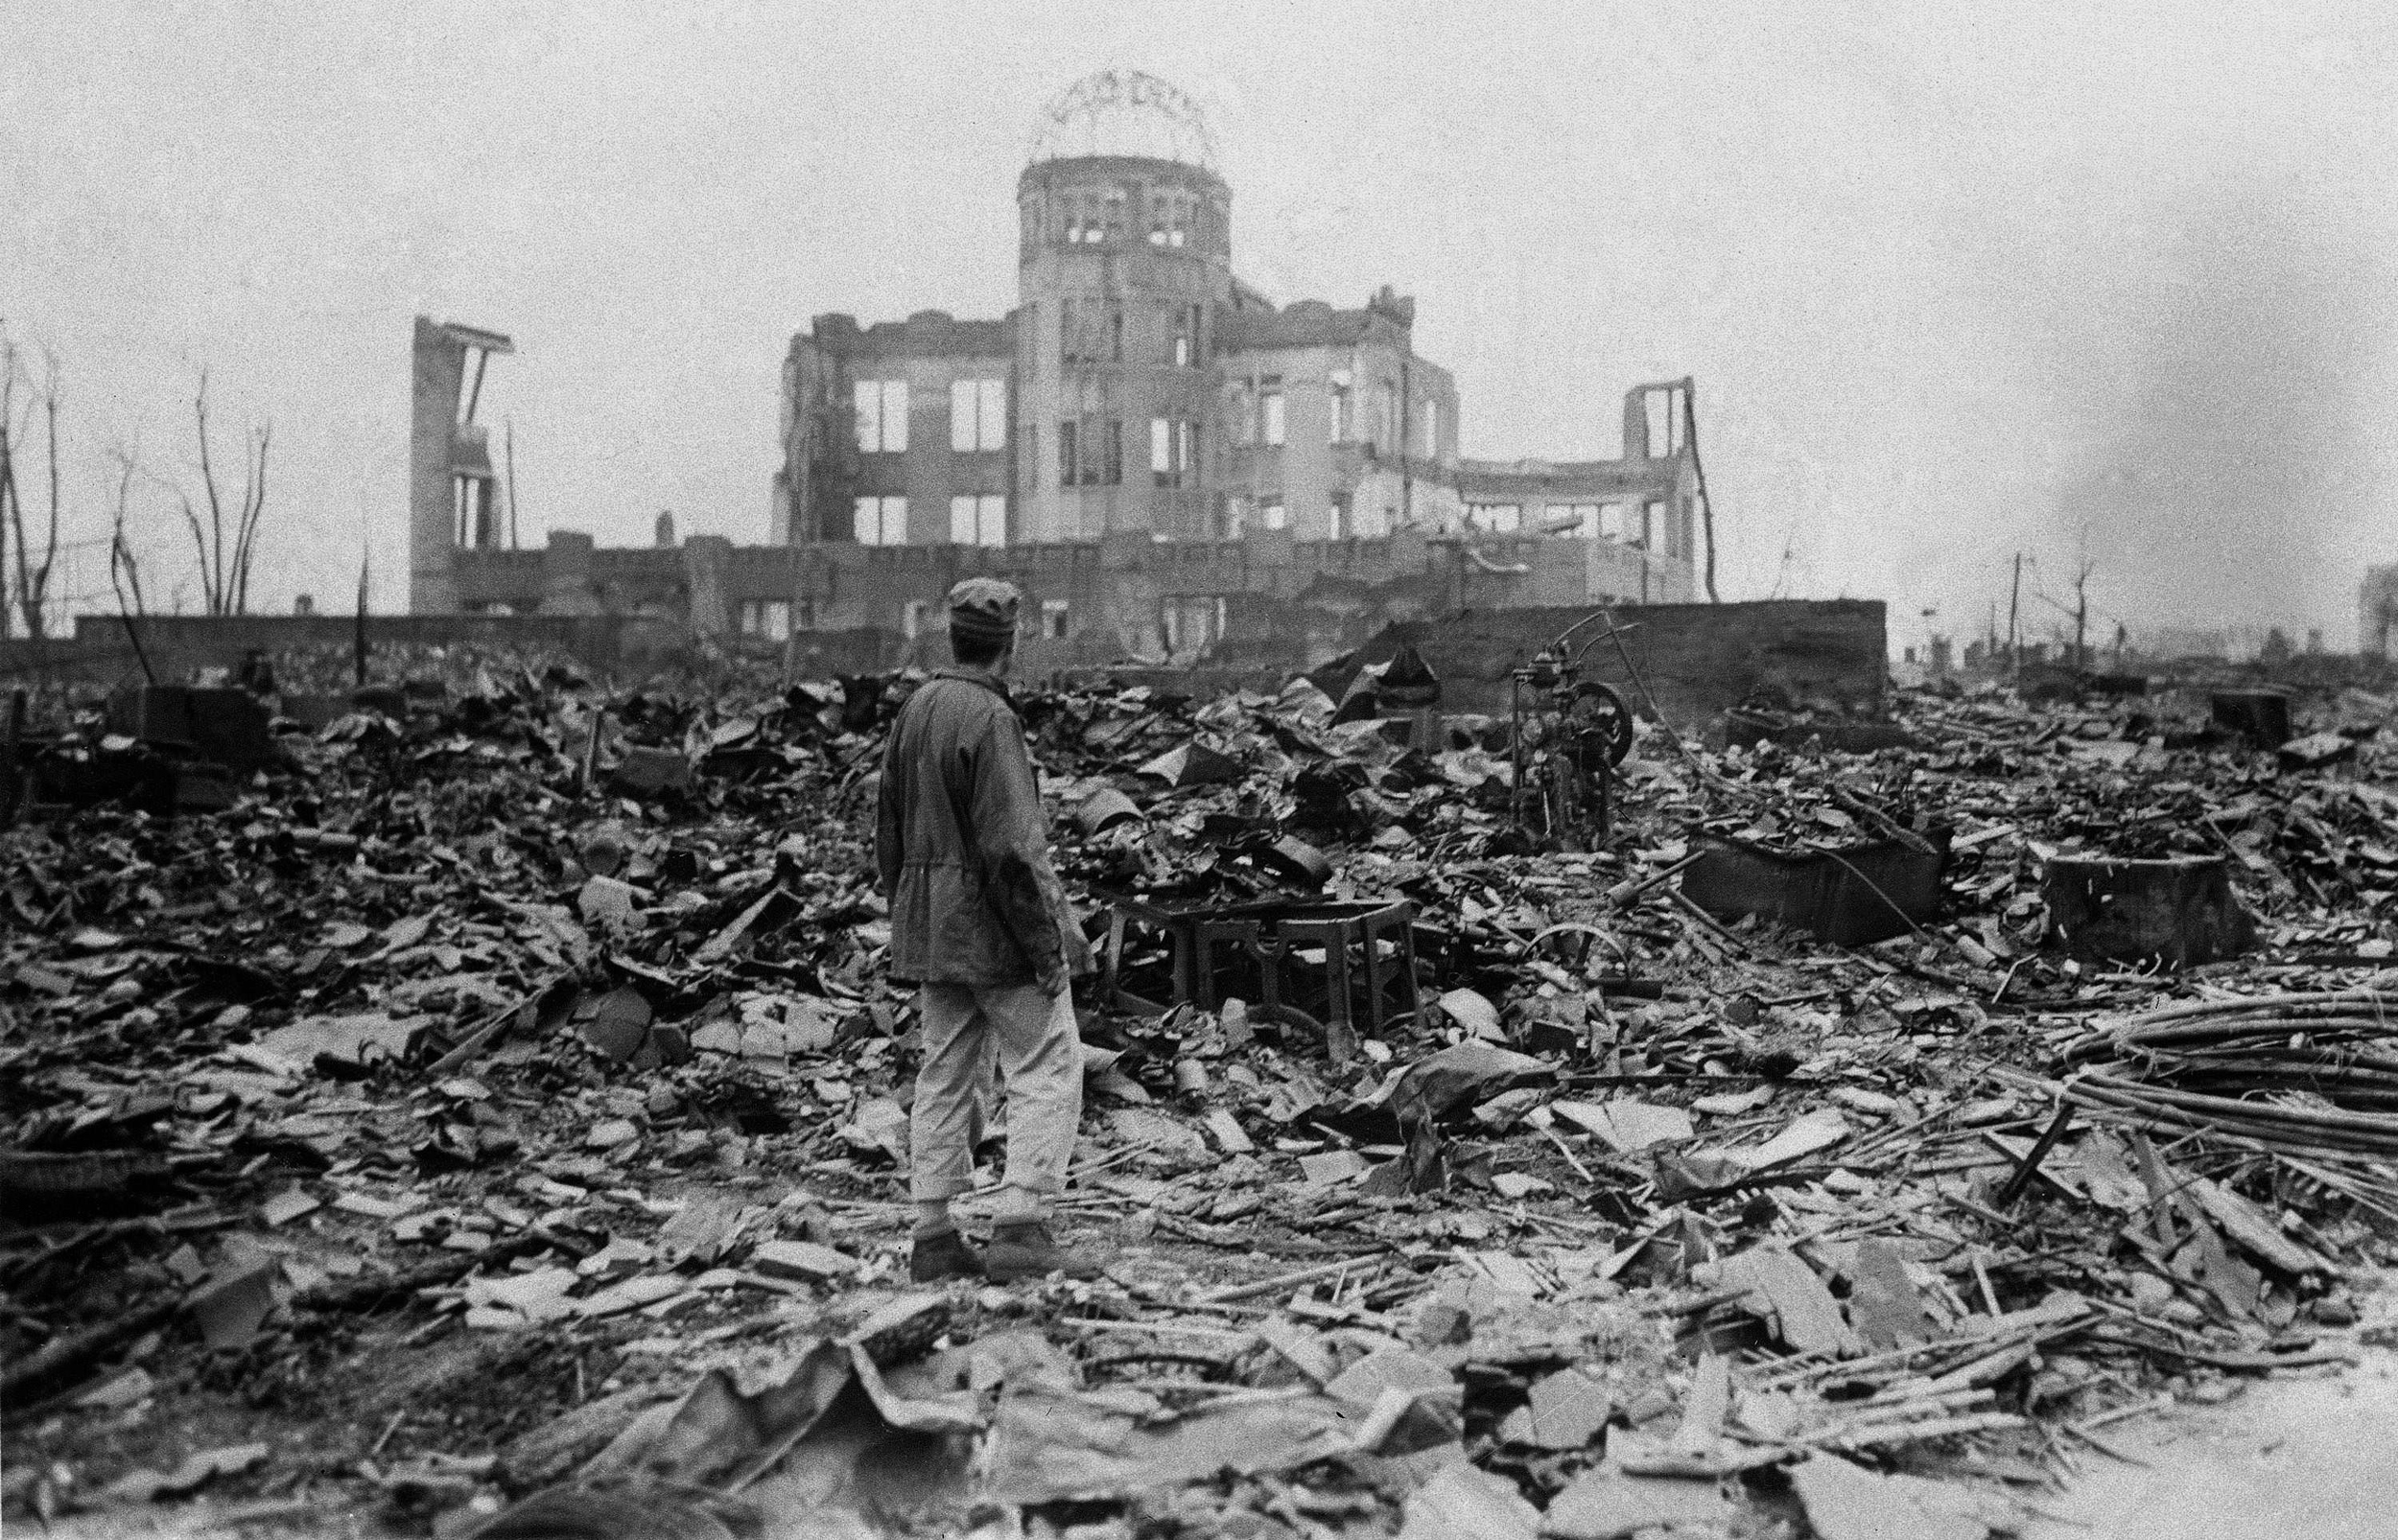 Atomic bomb dropped on Japan's Hiroshima 75 years ago still ...